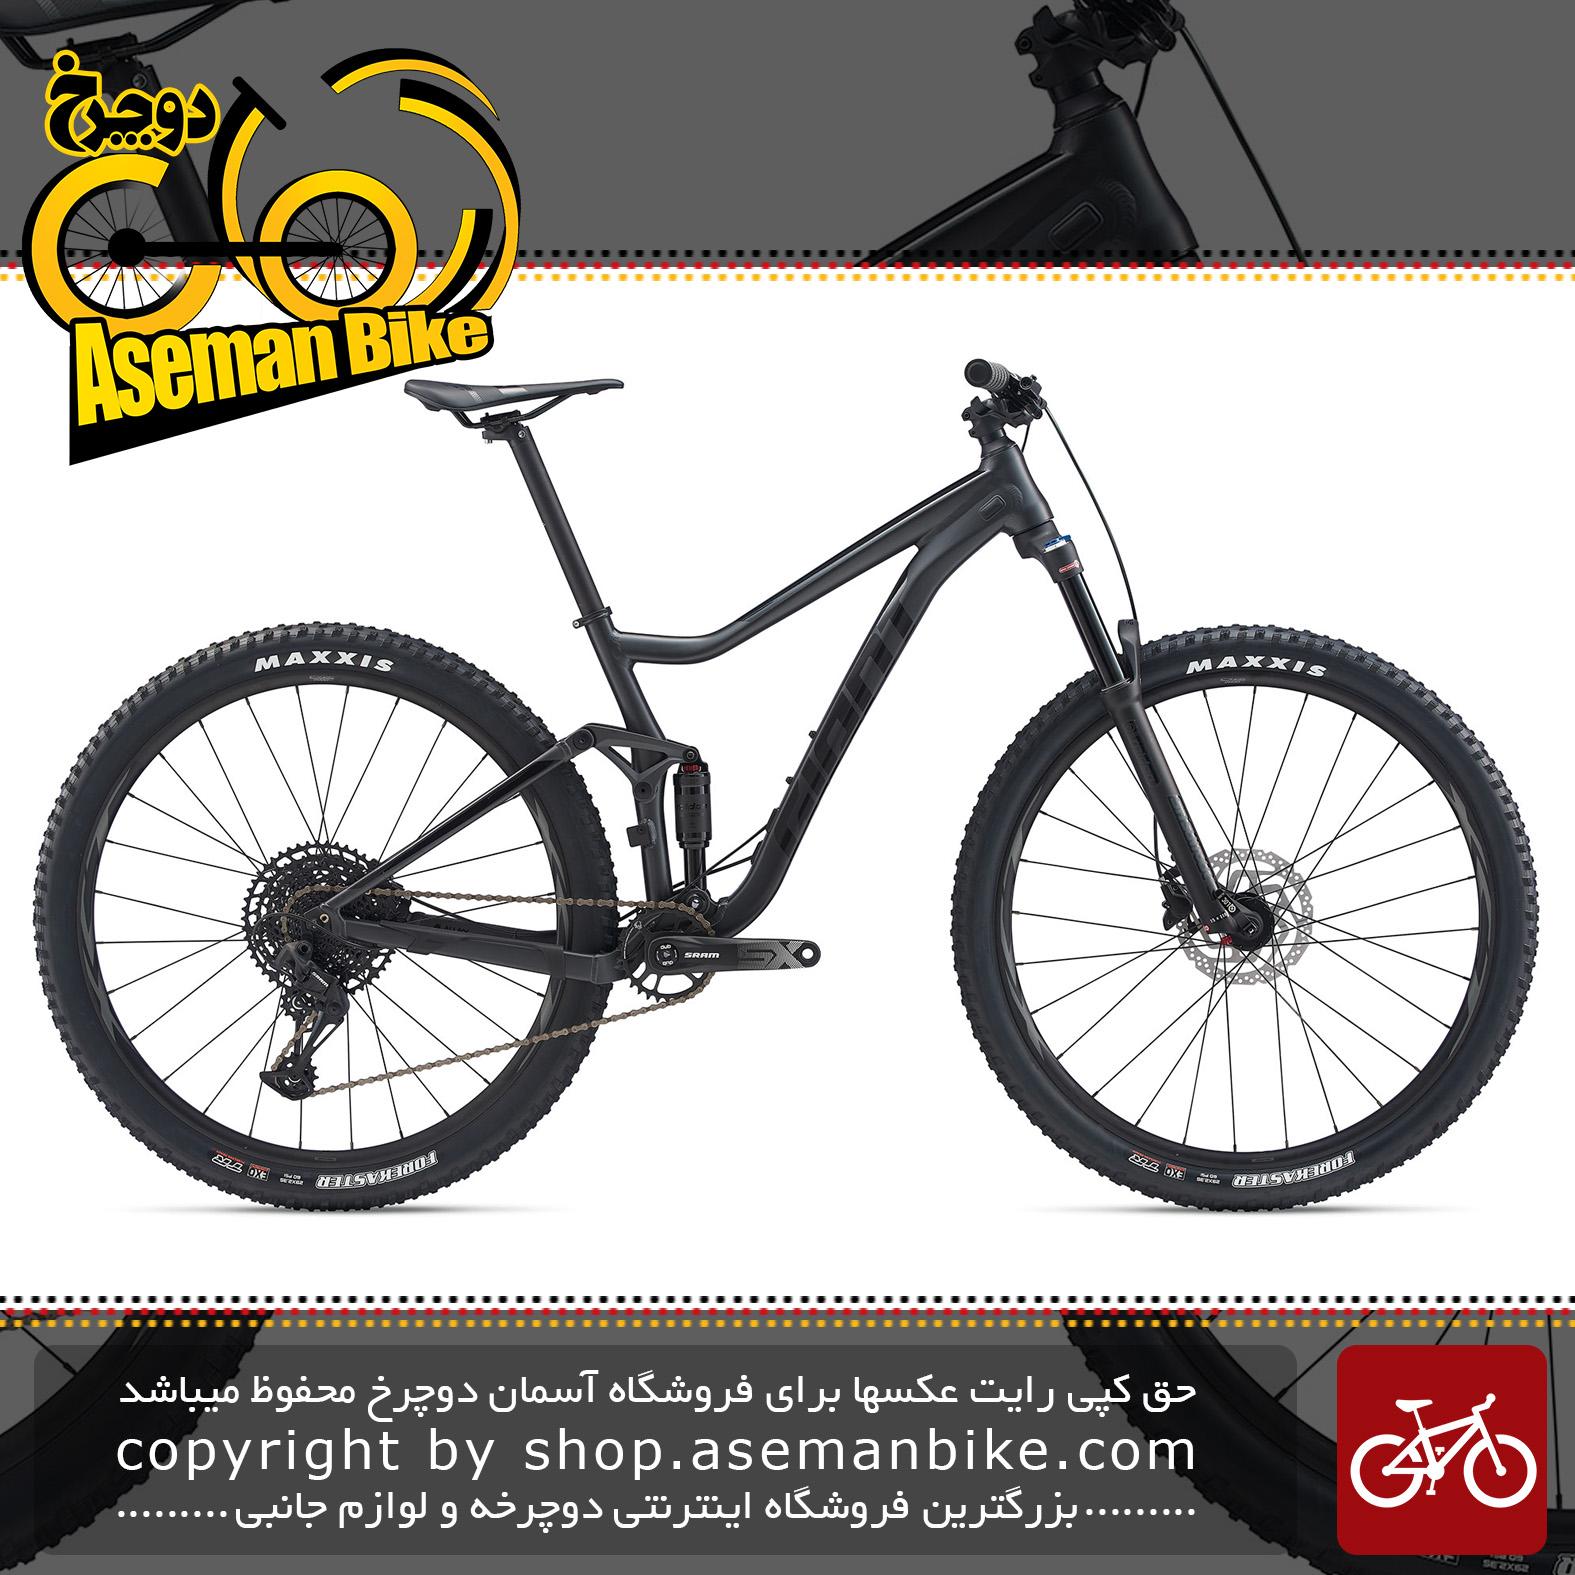 دوچرخه کوهستان جاینت مدل استنس 29 اینچ 2 2020 Giant Mountain Bicycle Stance 29 2 2020